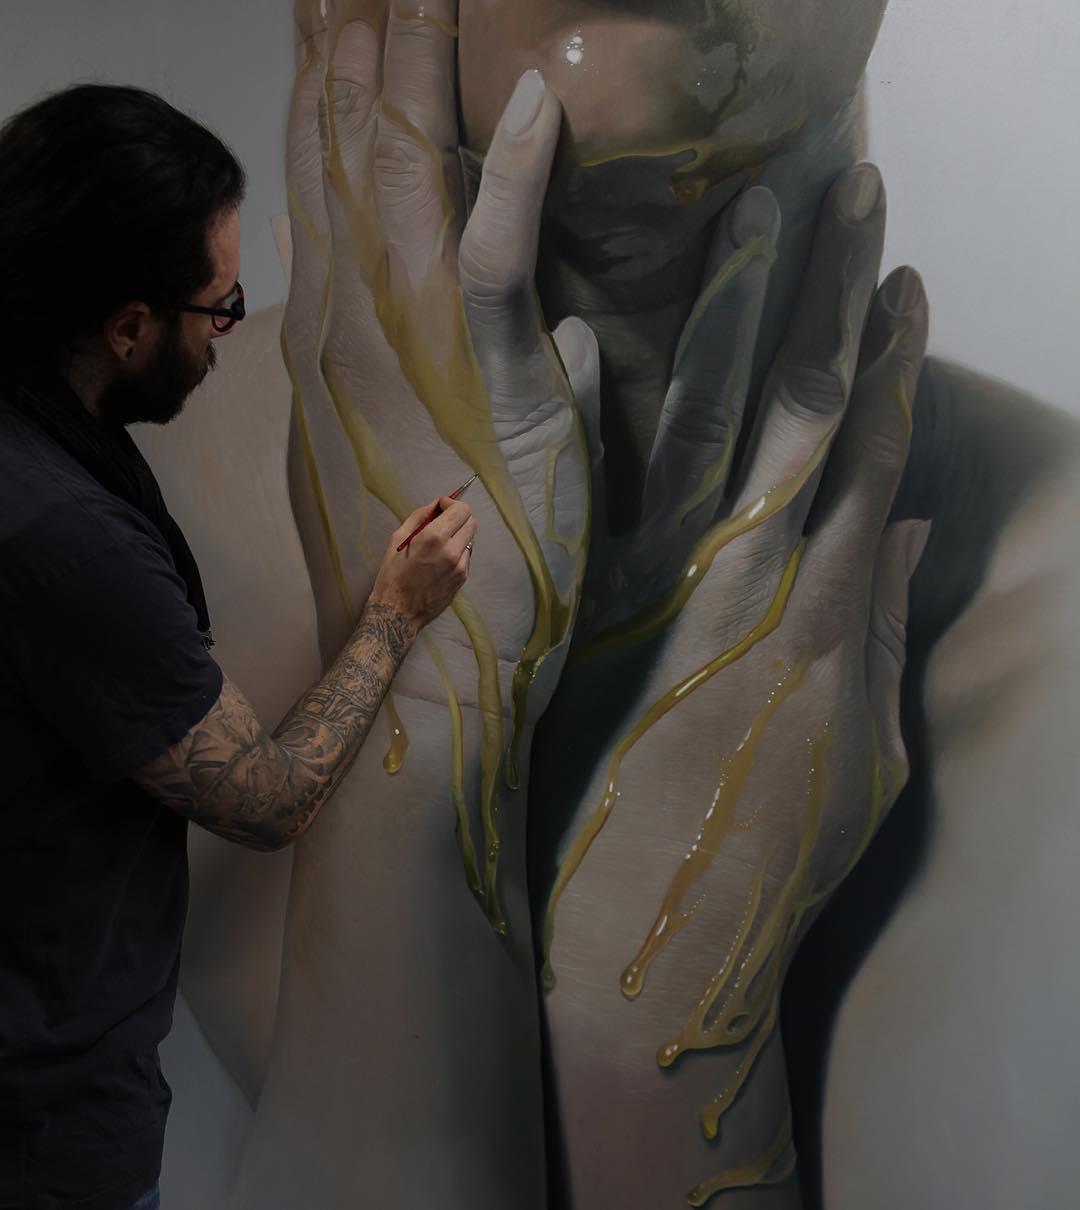 Mike Darkas – Hyper-realistic paintings portrait details